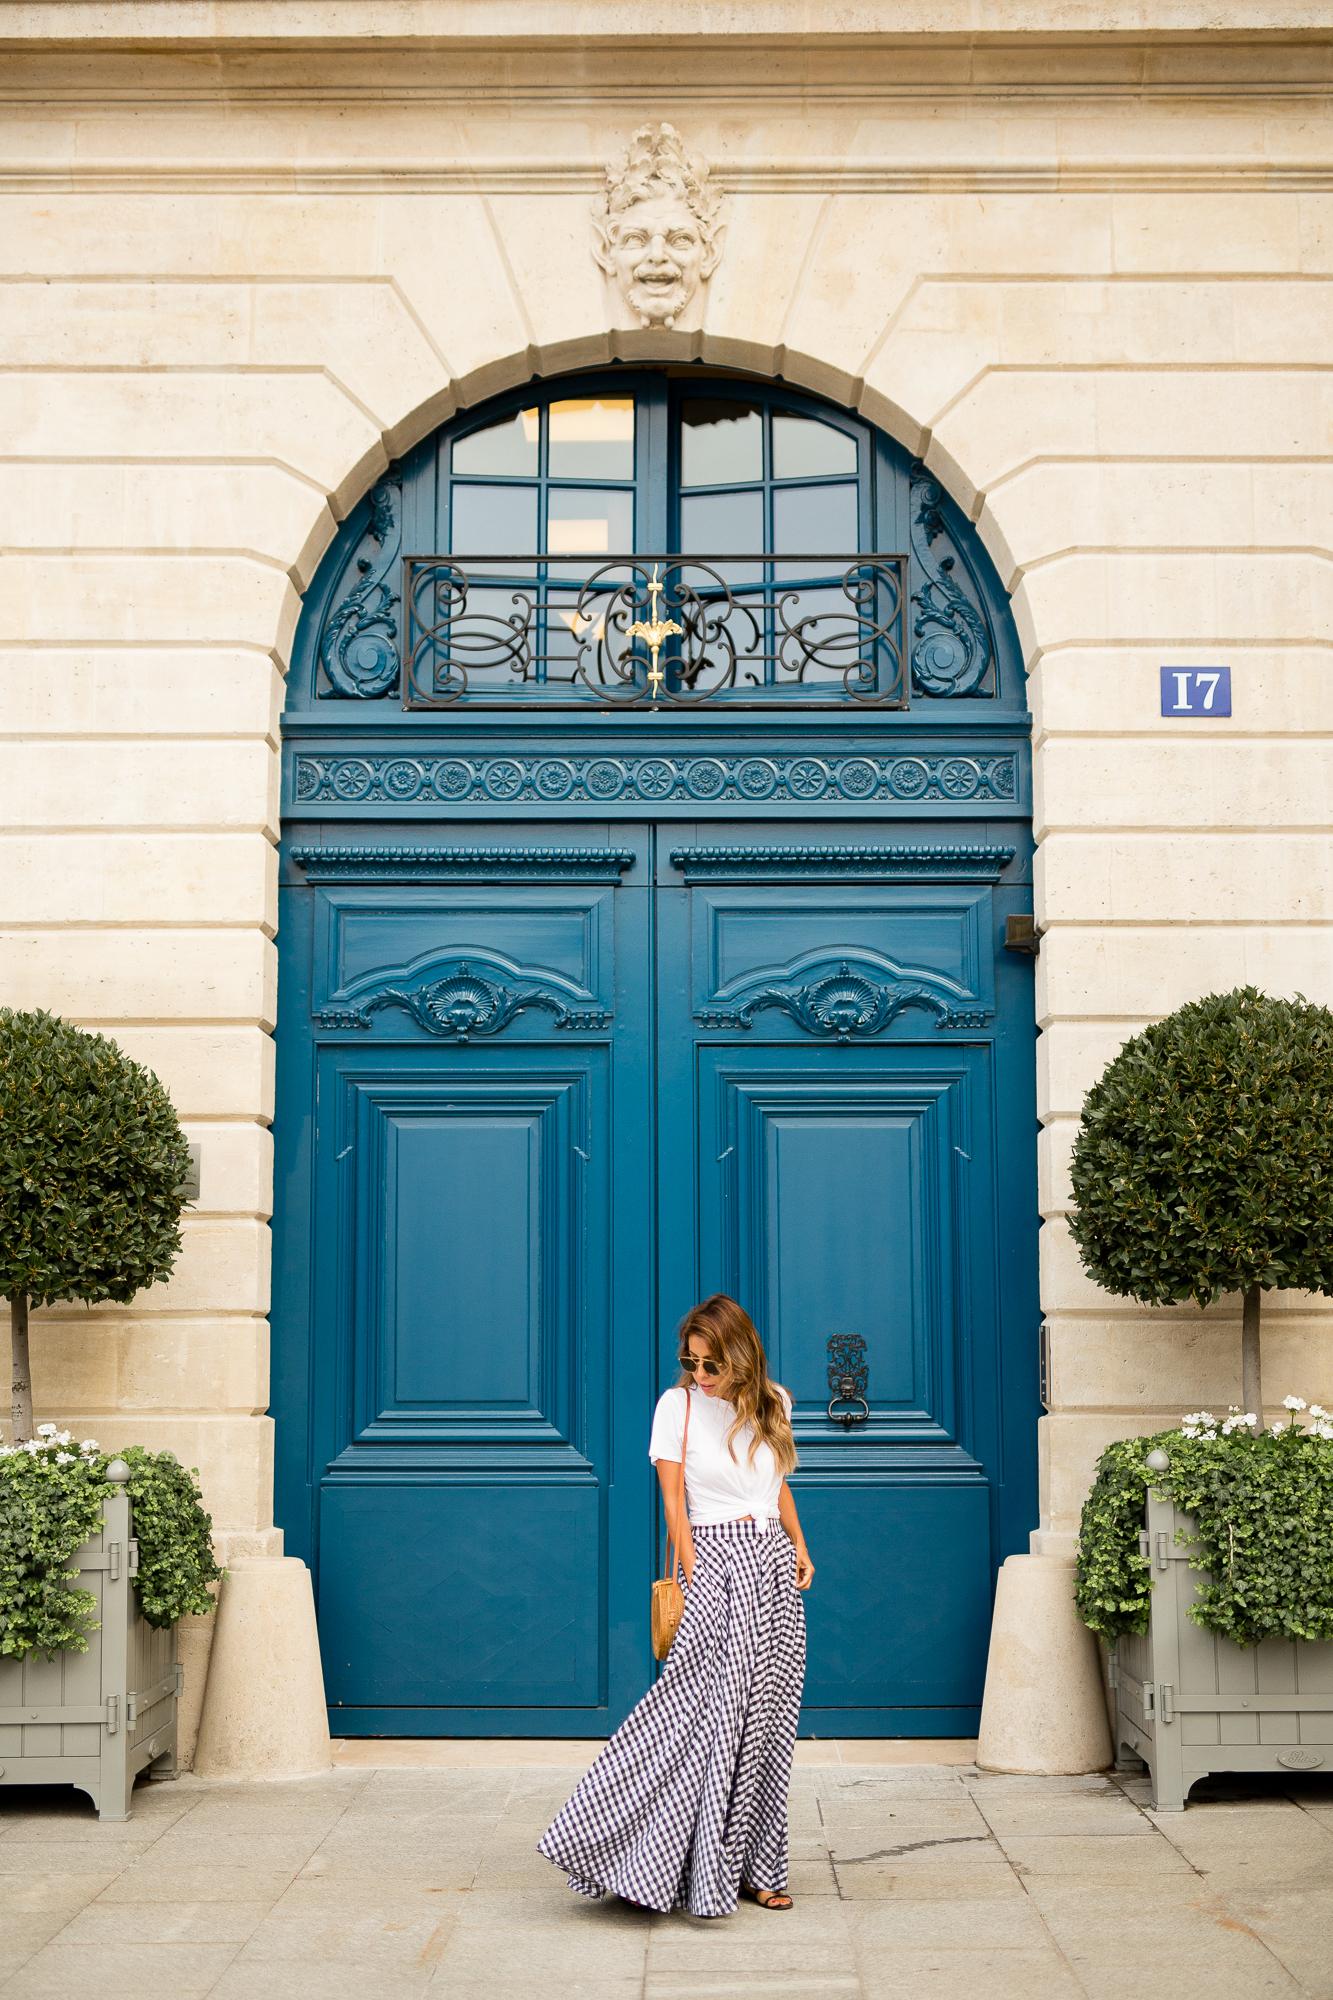 Paris Place Vendome, Everyday Pursuits goes to Paris, Fame + Partners Gingham Skirt